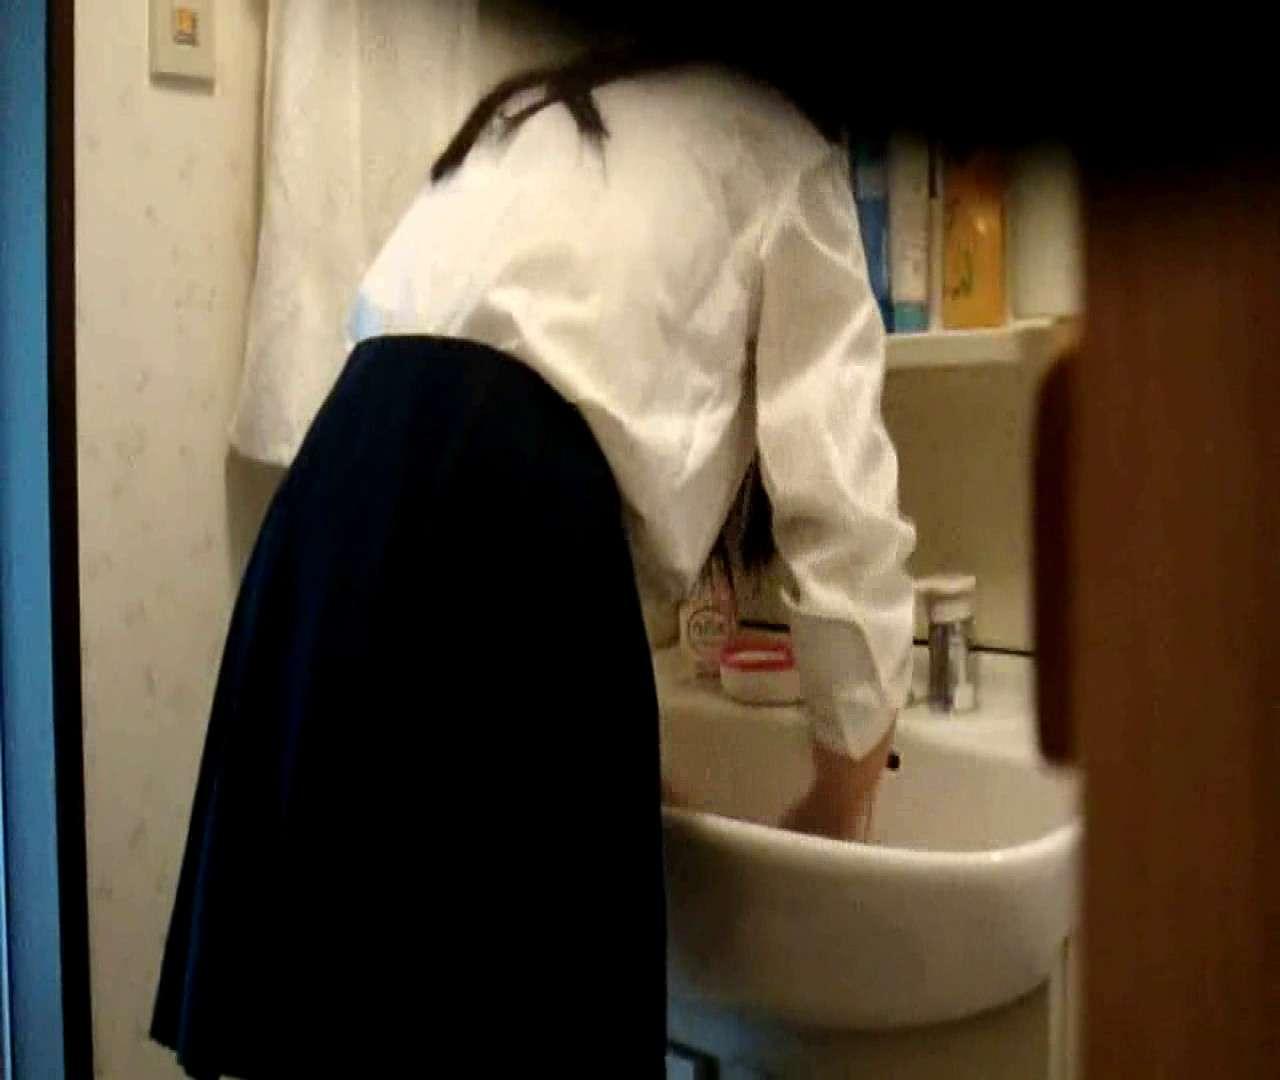 vol.5 まどかが帰宅後の洗顔後にブラを洗ってます。 ギャル達  112枚 112